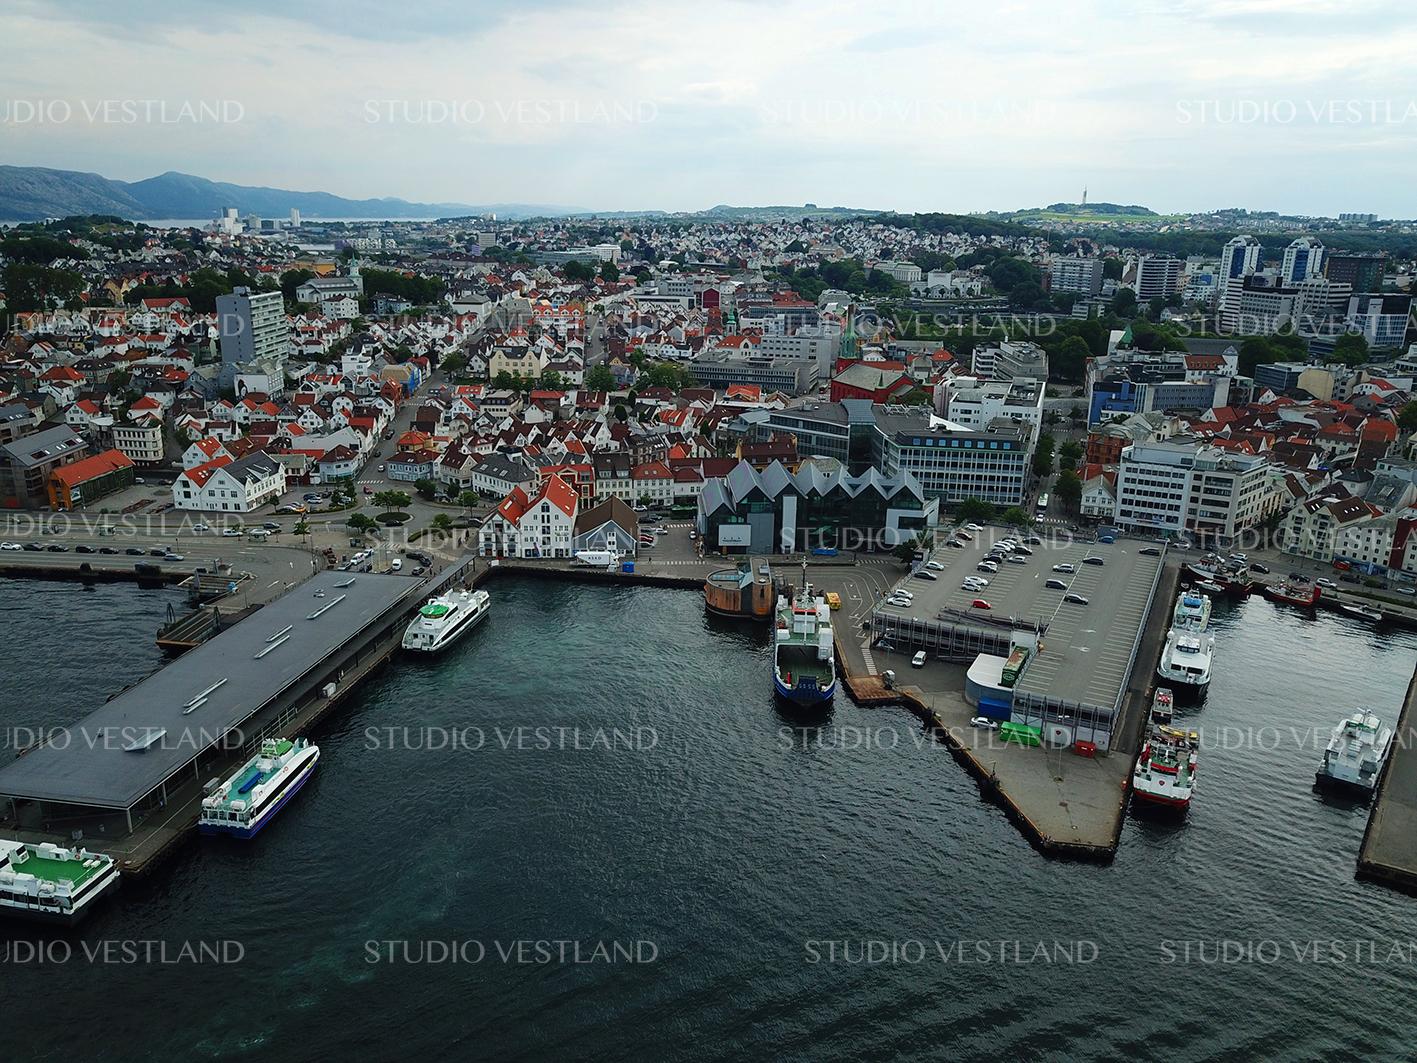 Studio Vestland - Stavanger 20